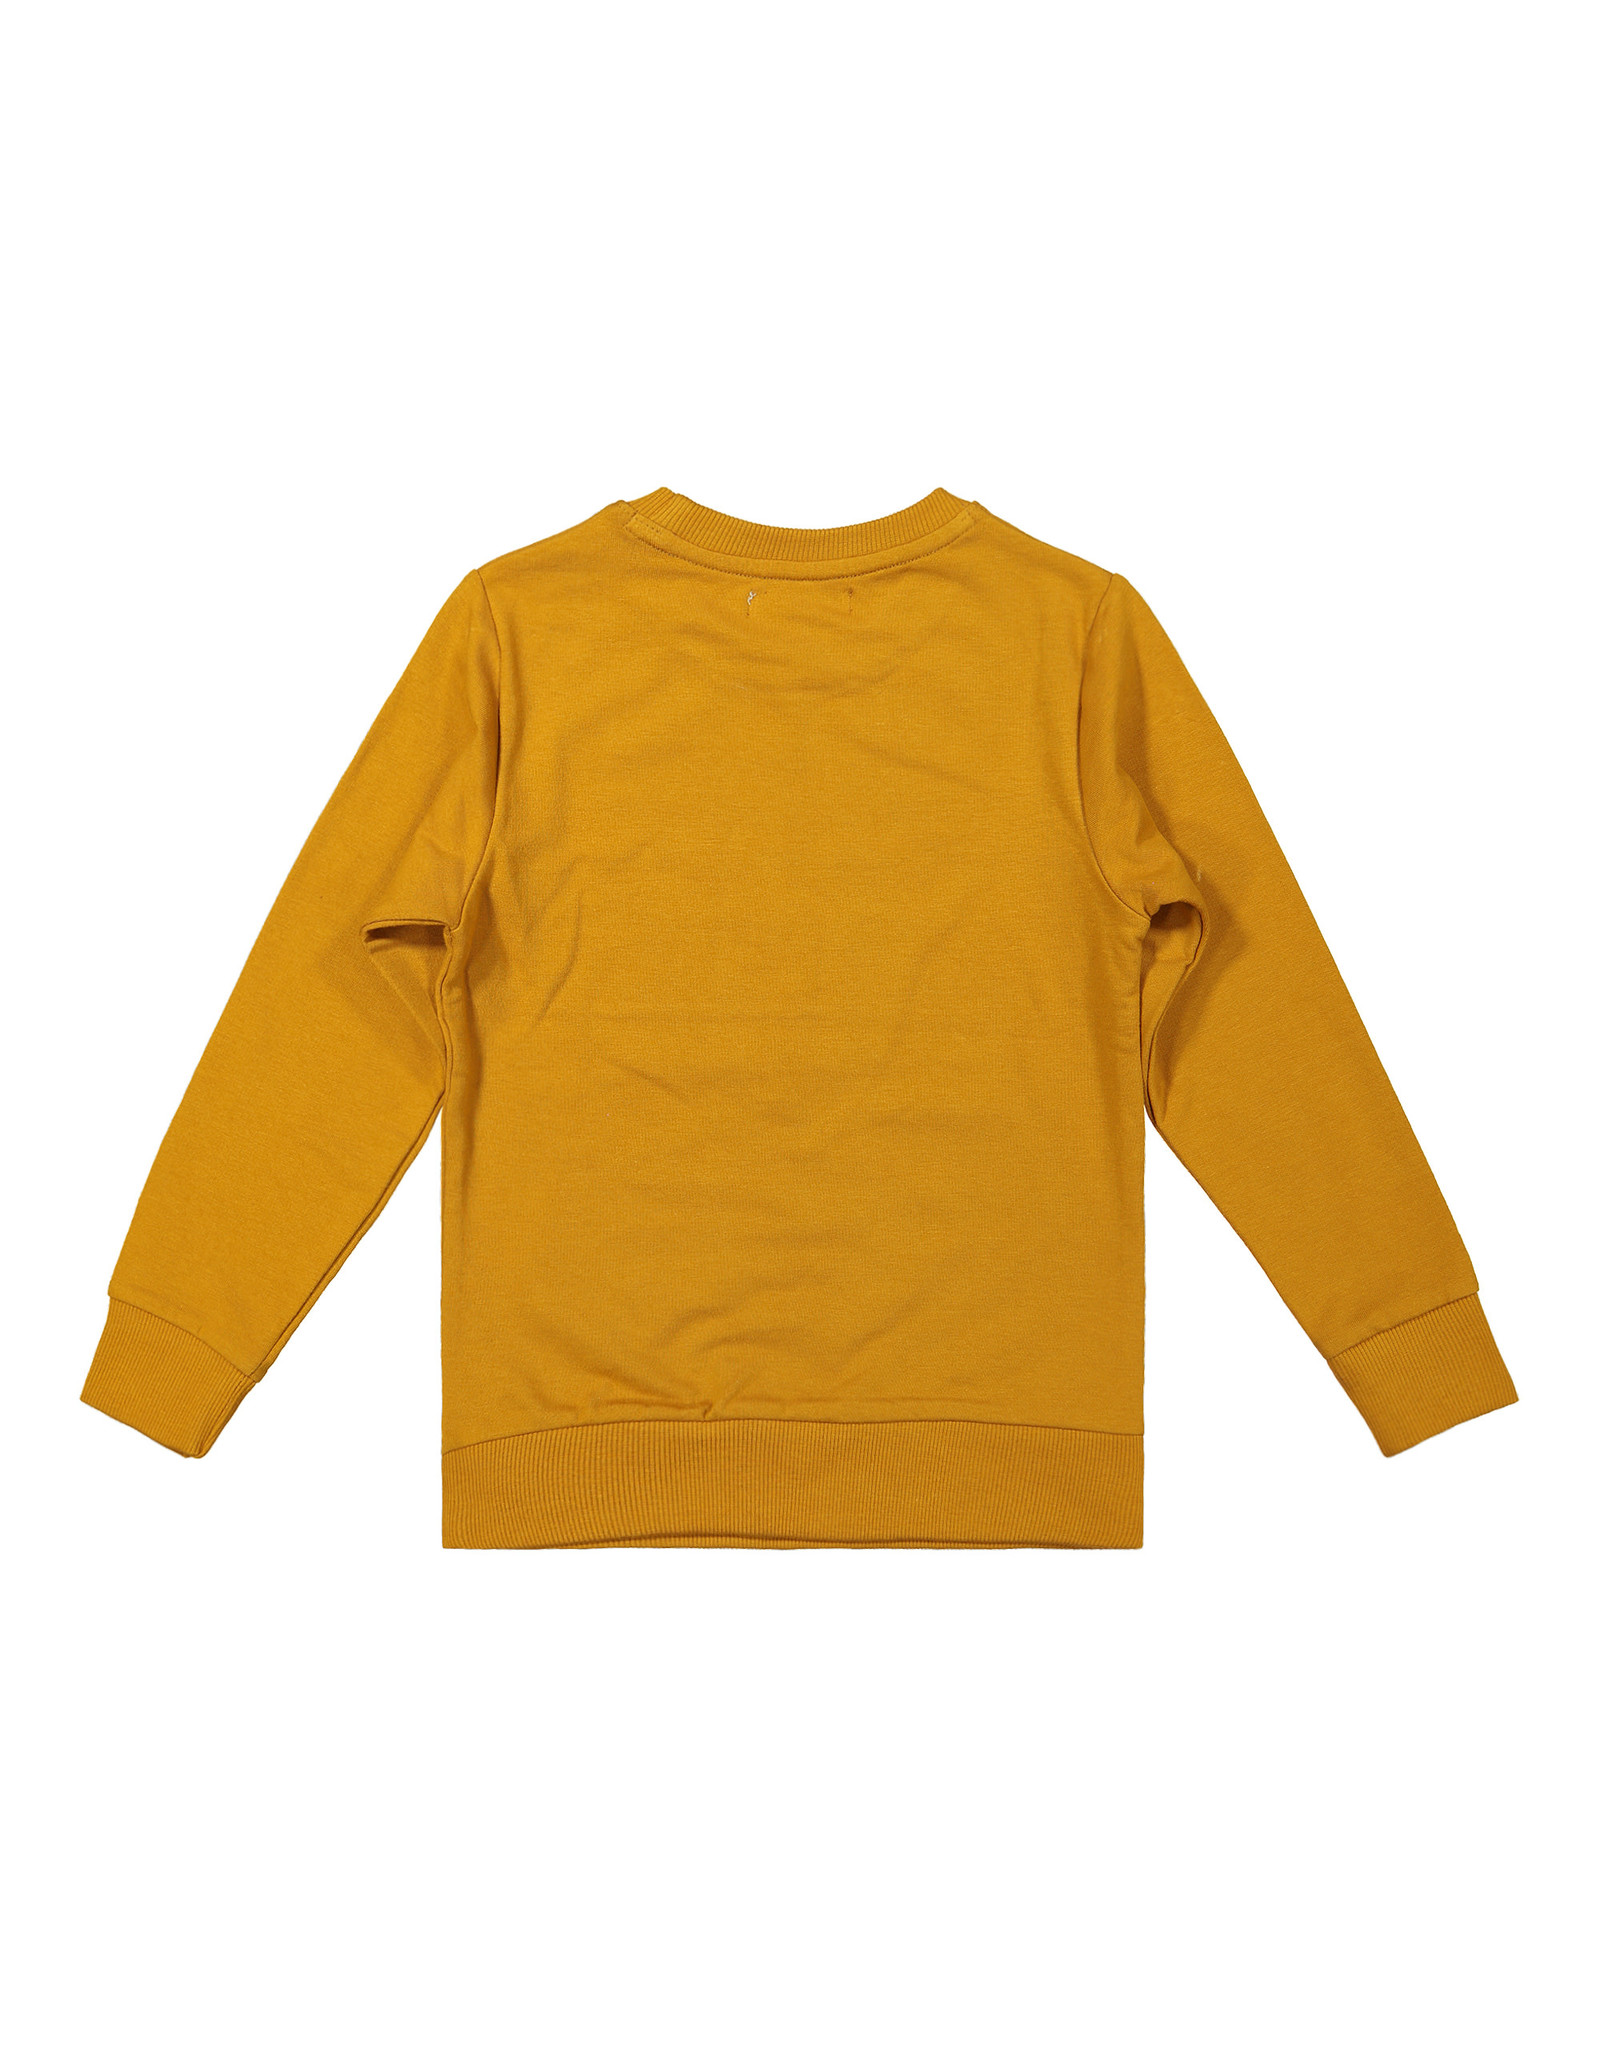 DJ Dutchjeans DJ Dutchjeans jongens sweater Go Away Camel